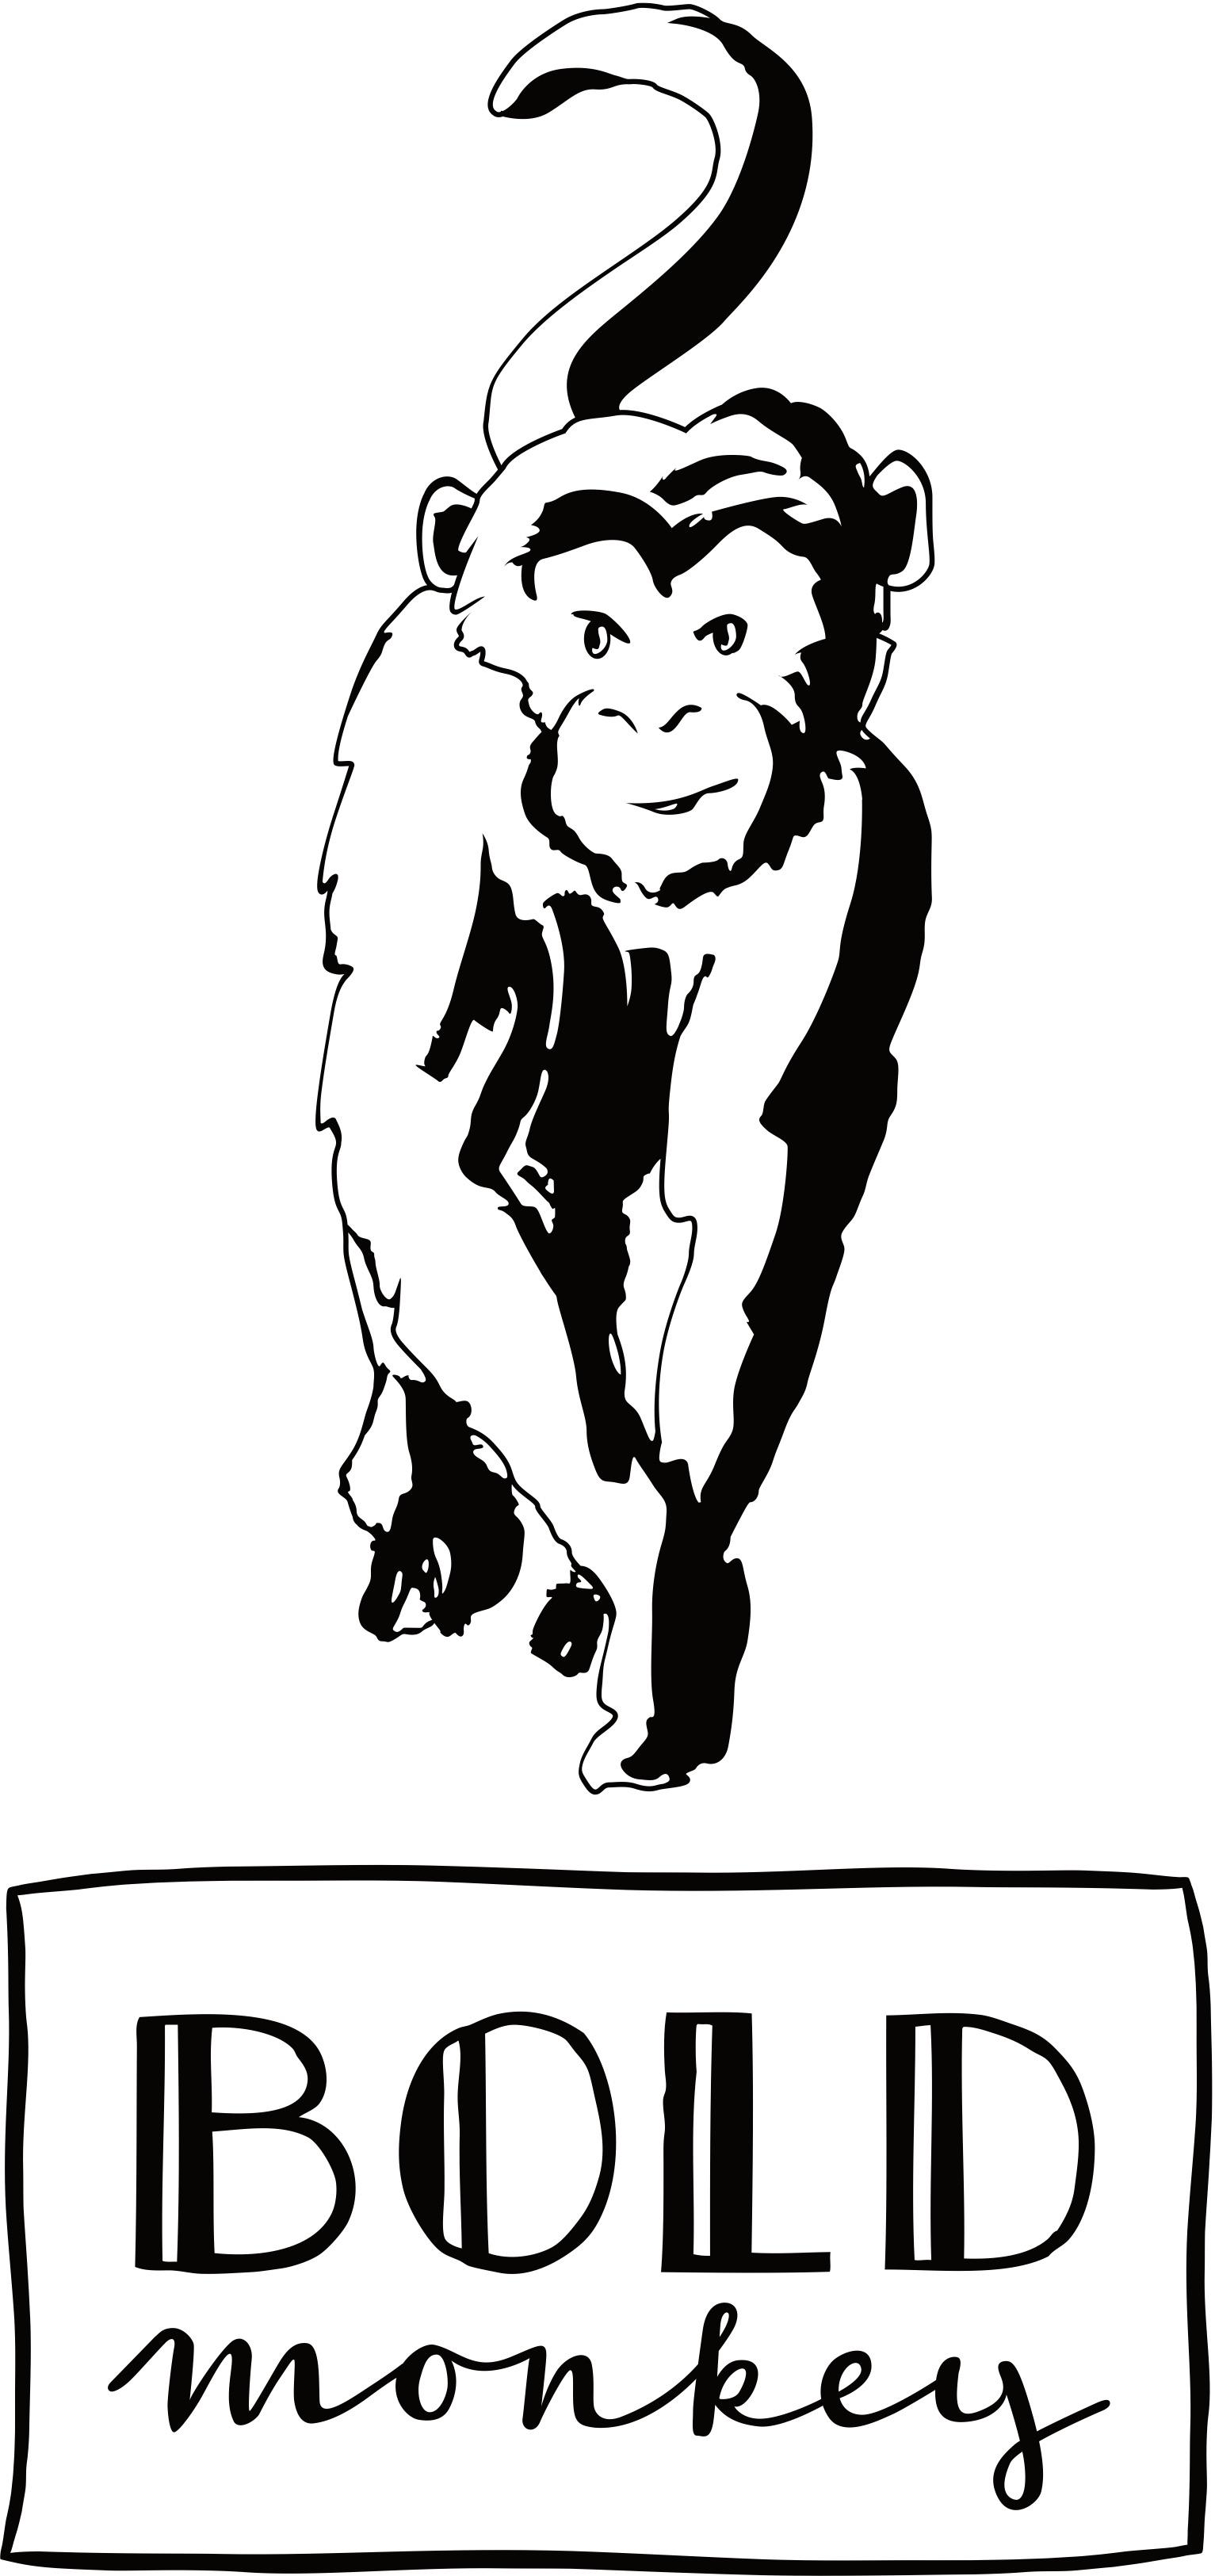 Bold Monkey i am not a macaron barkruk velvet oker geel gouden poten vooraanzicht